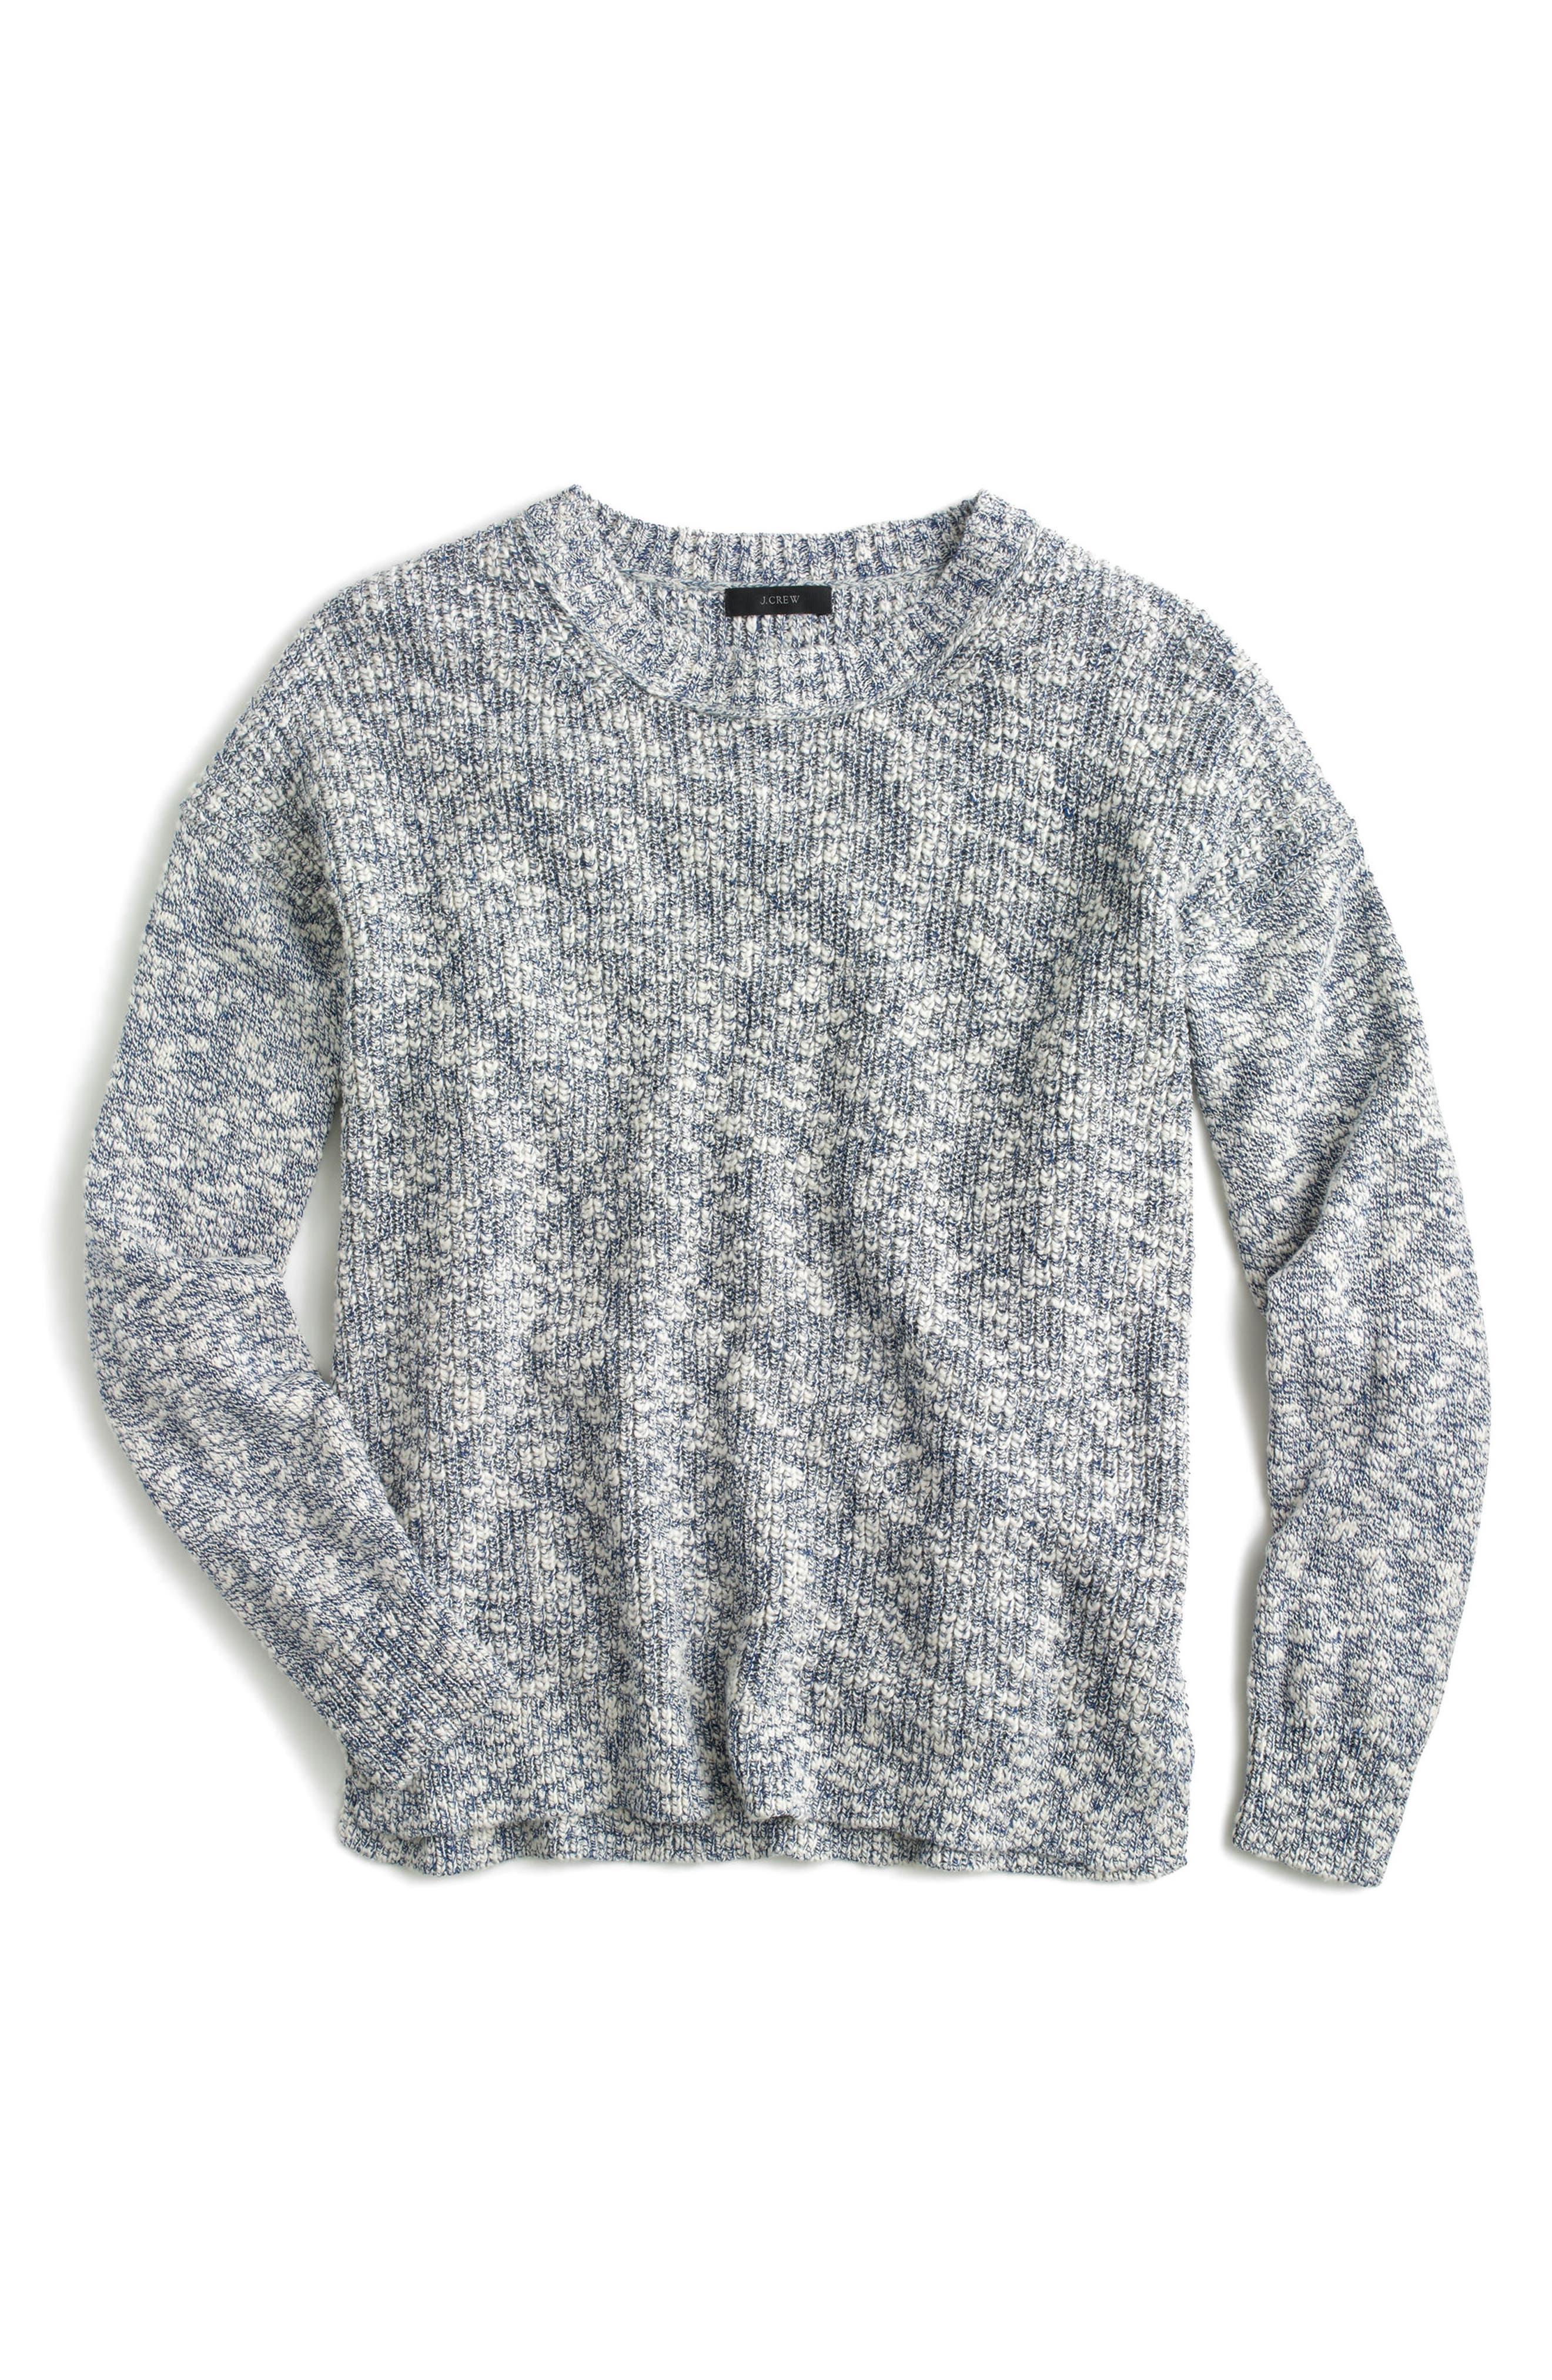 J.Crew Oversize Marled Yarn Sweater